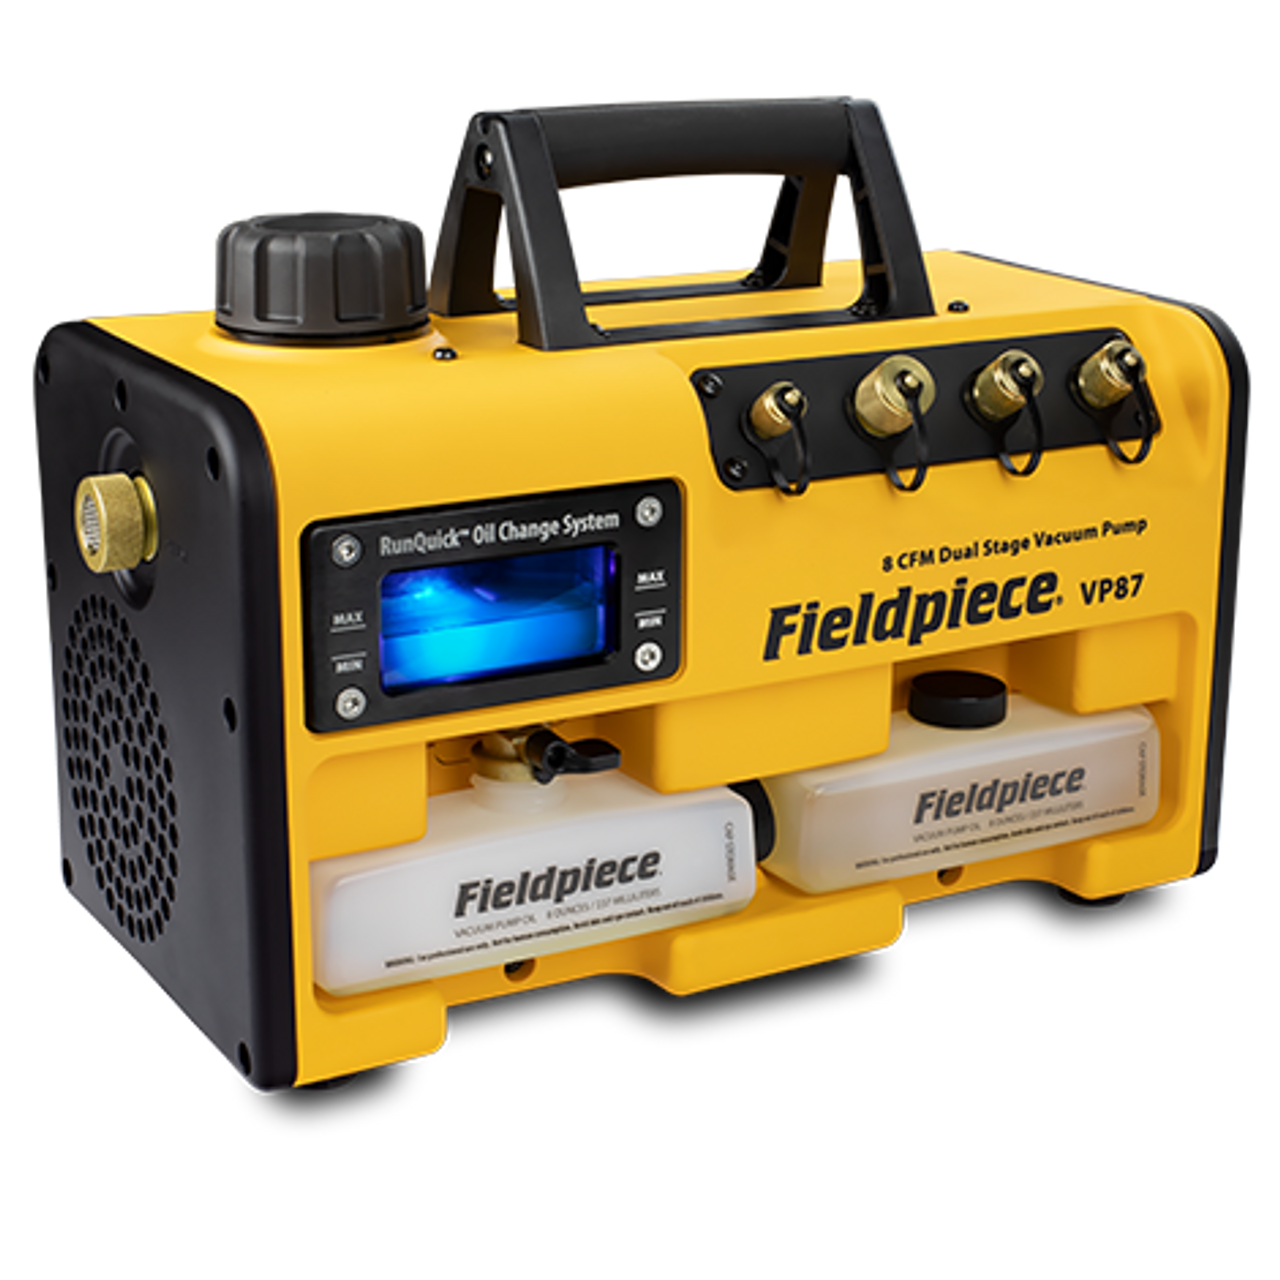 Refrigeration Vacuum Pump 227L- R32 Ready - VP87 Fieldpiece